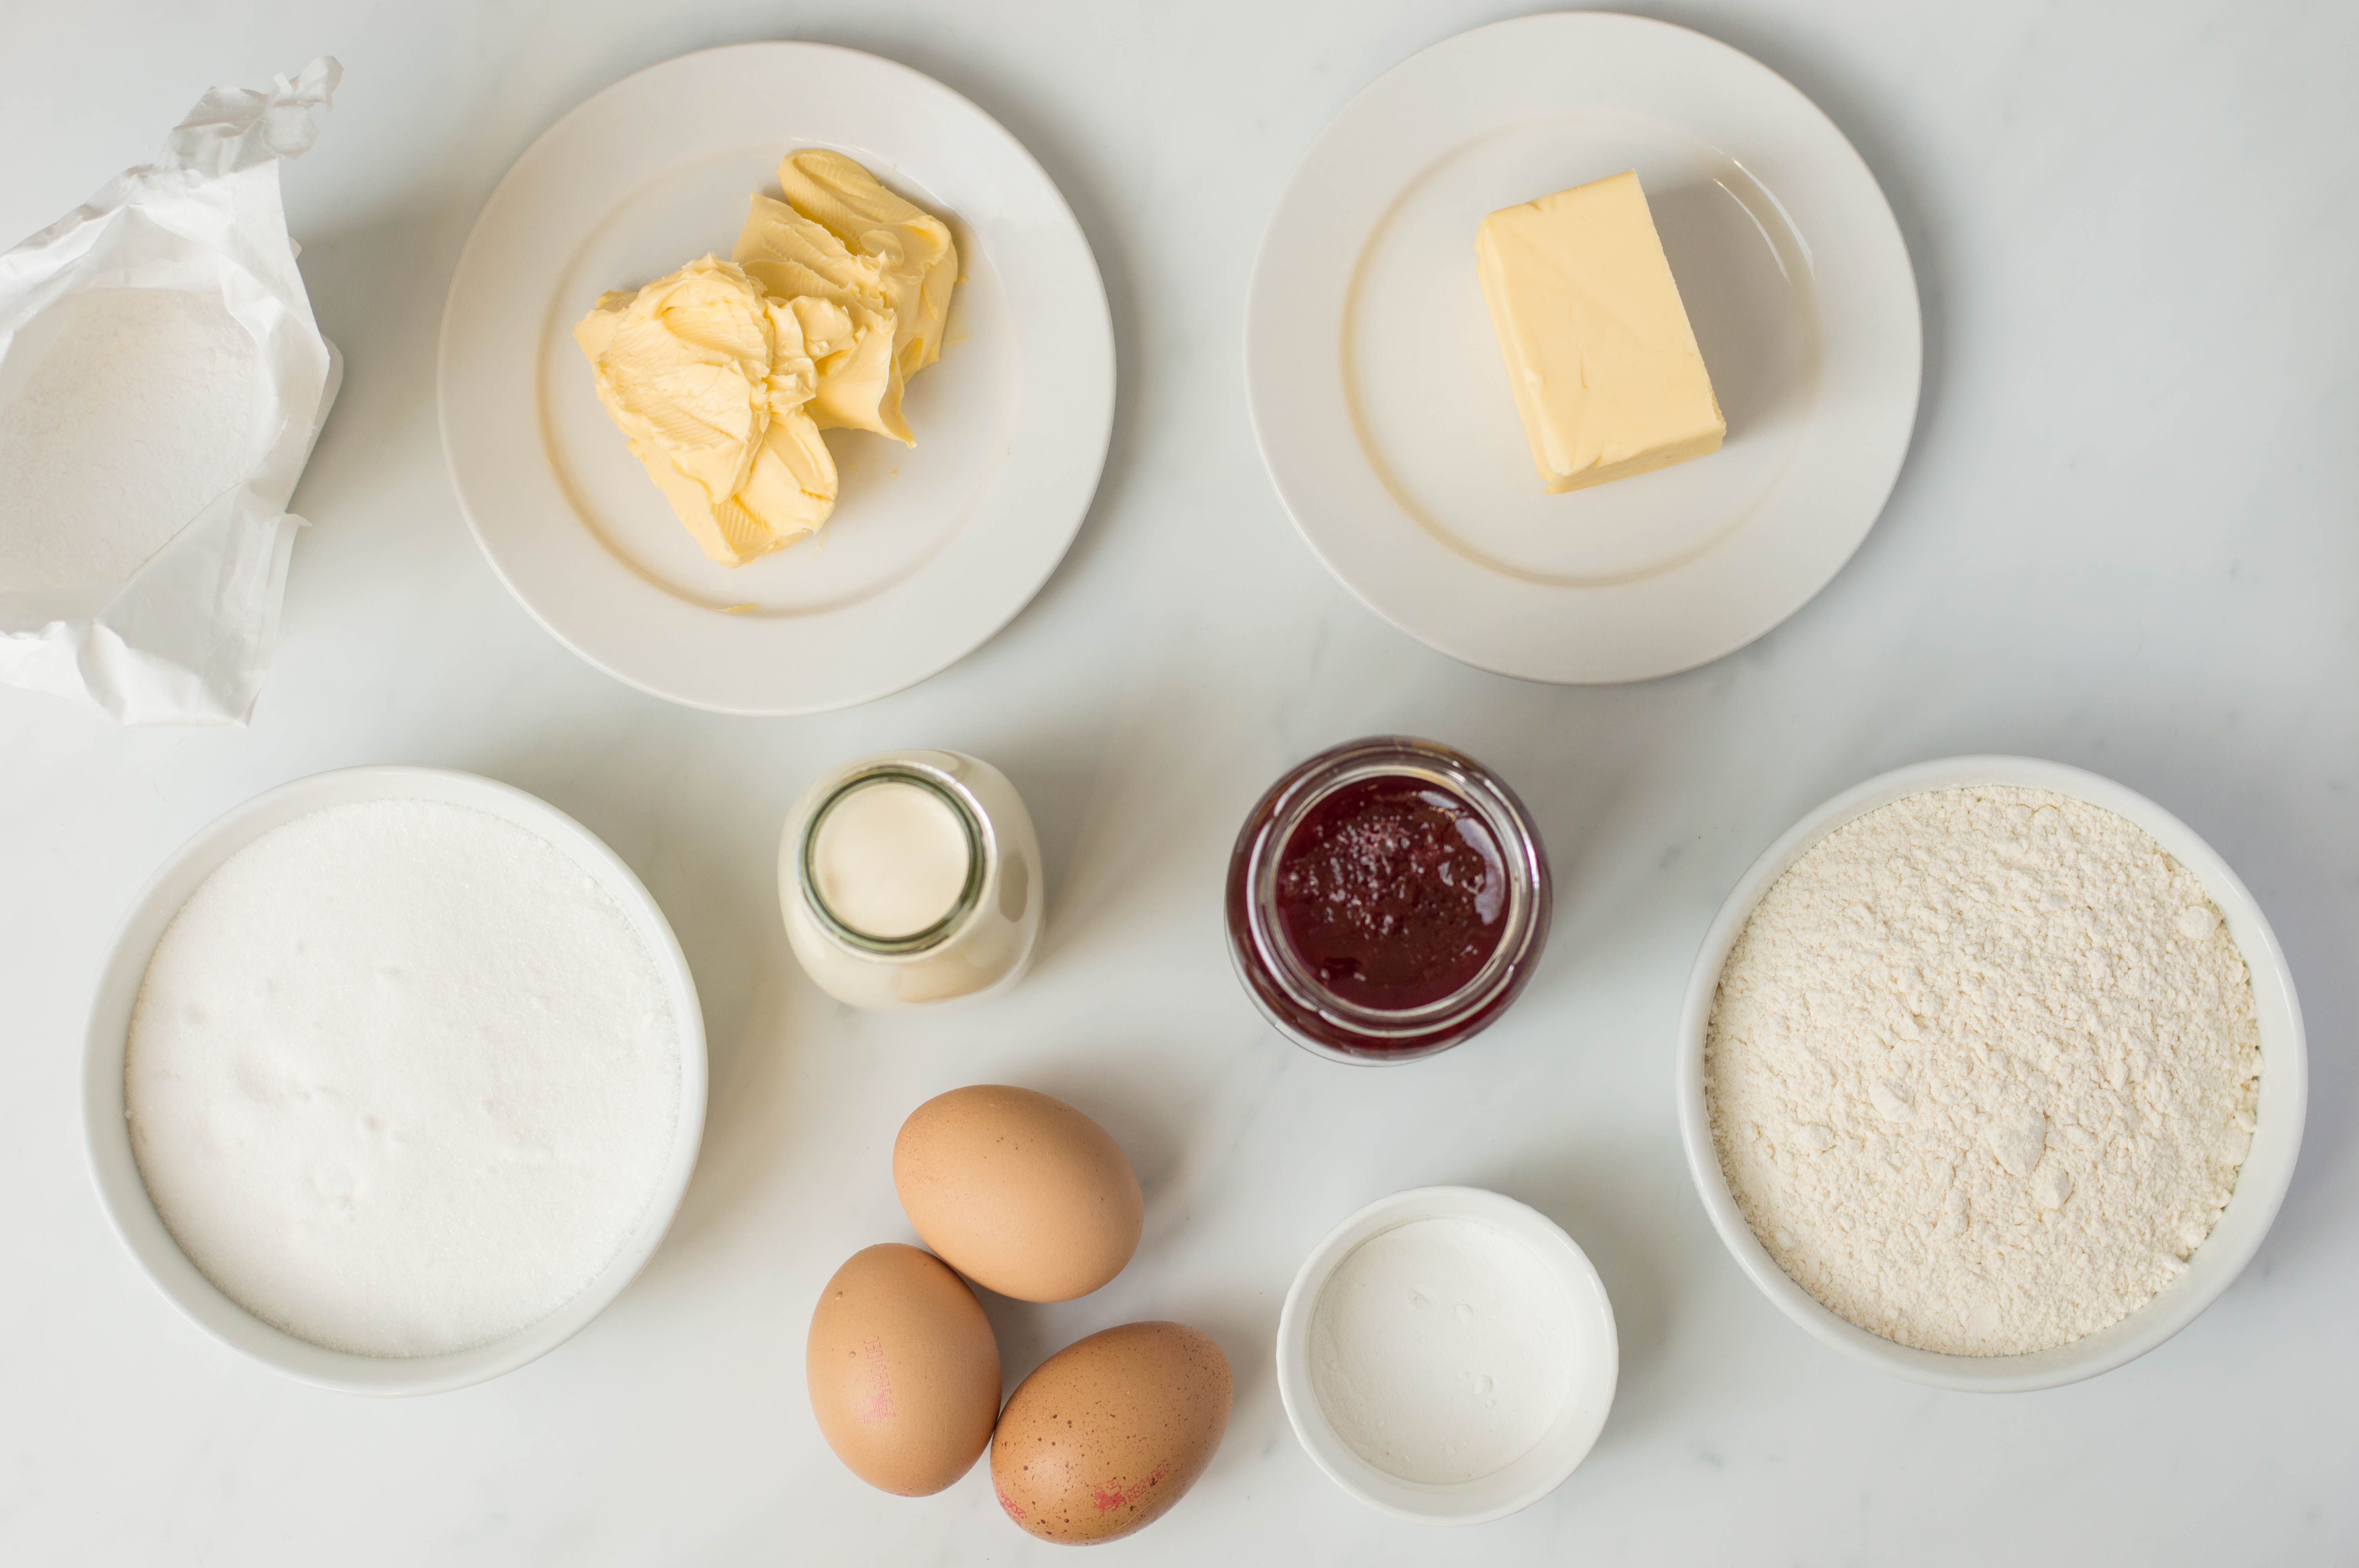 Victoria sponge cake ingredients